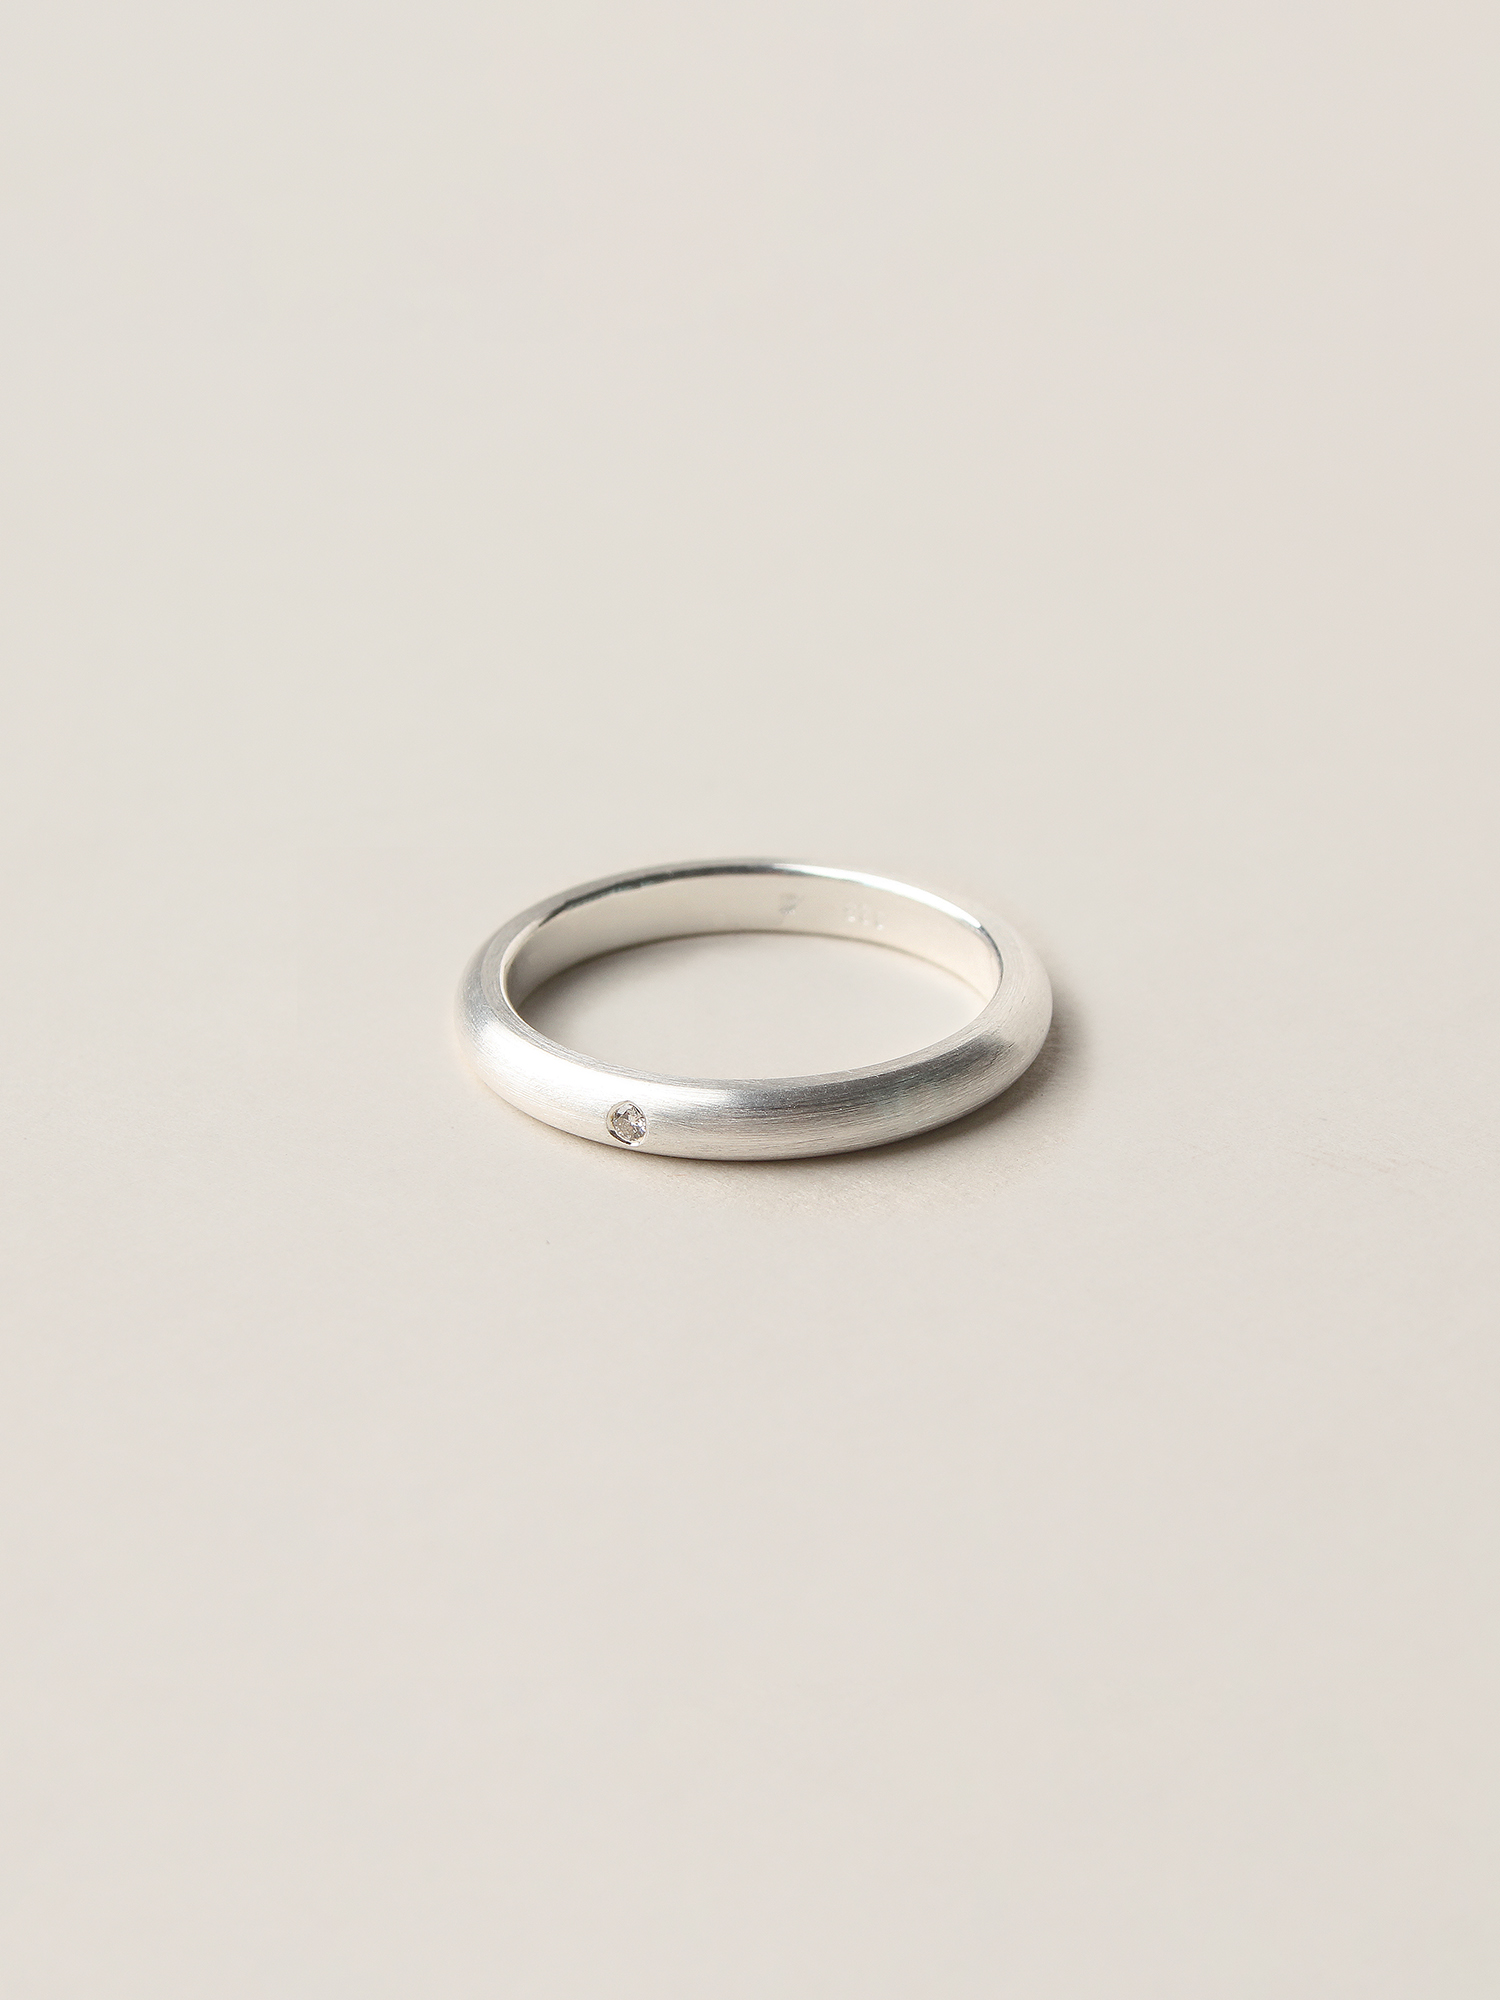 Christina-Pauls-Ring-Verlobungsring-Diamant-Silber2.jpg